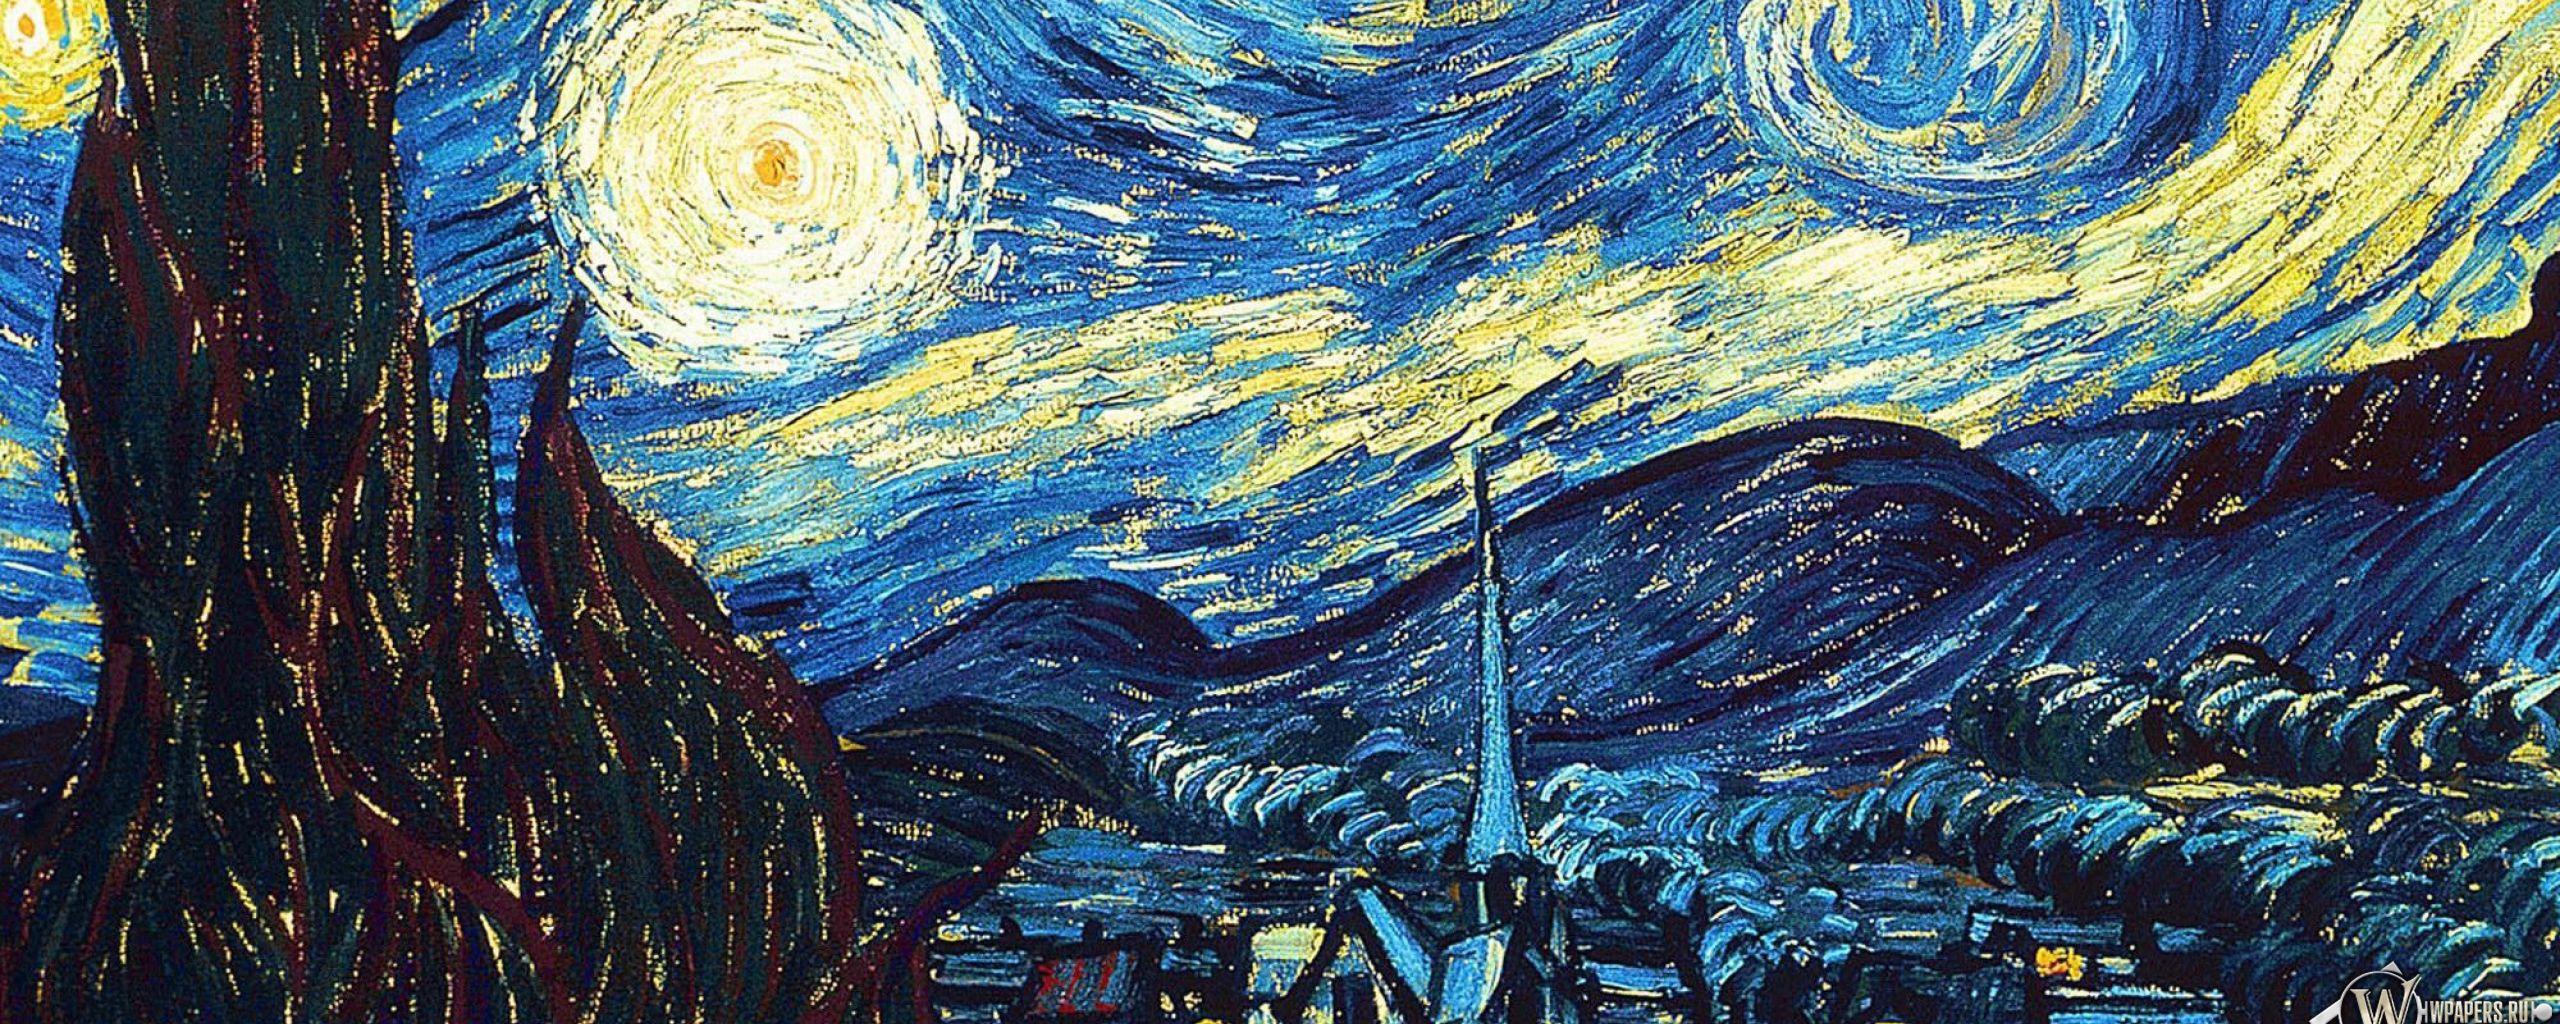 2560x1024 Wallpaper vincent van gogh, the starry night, oil, canvas